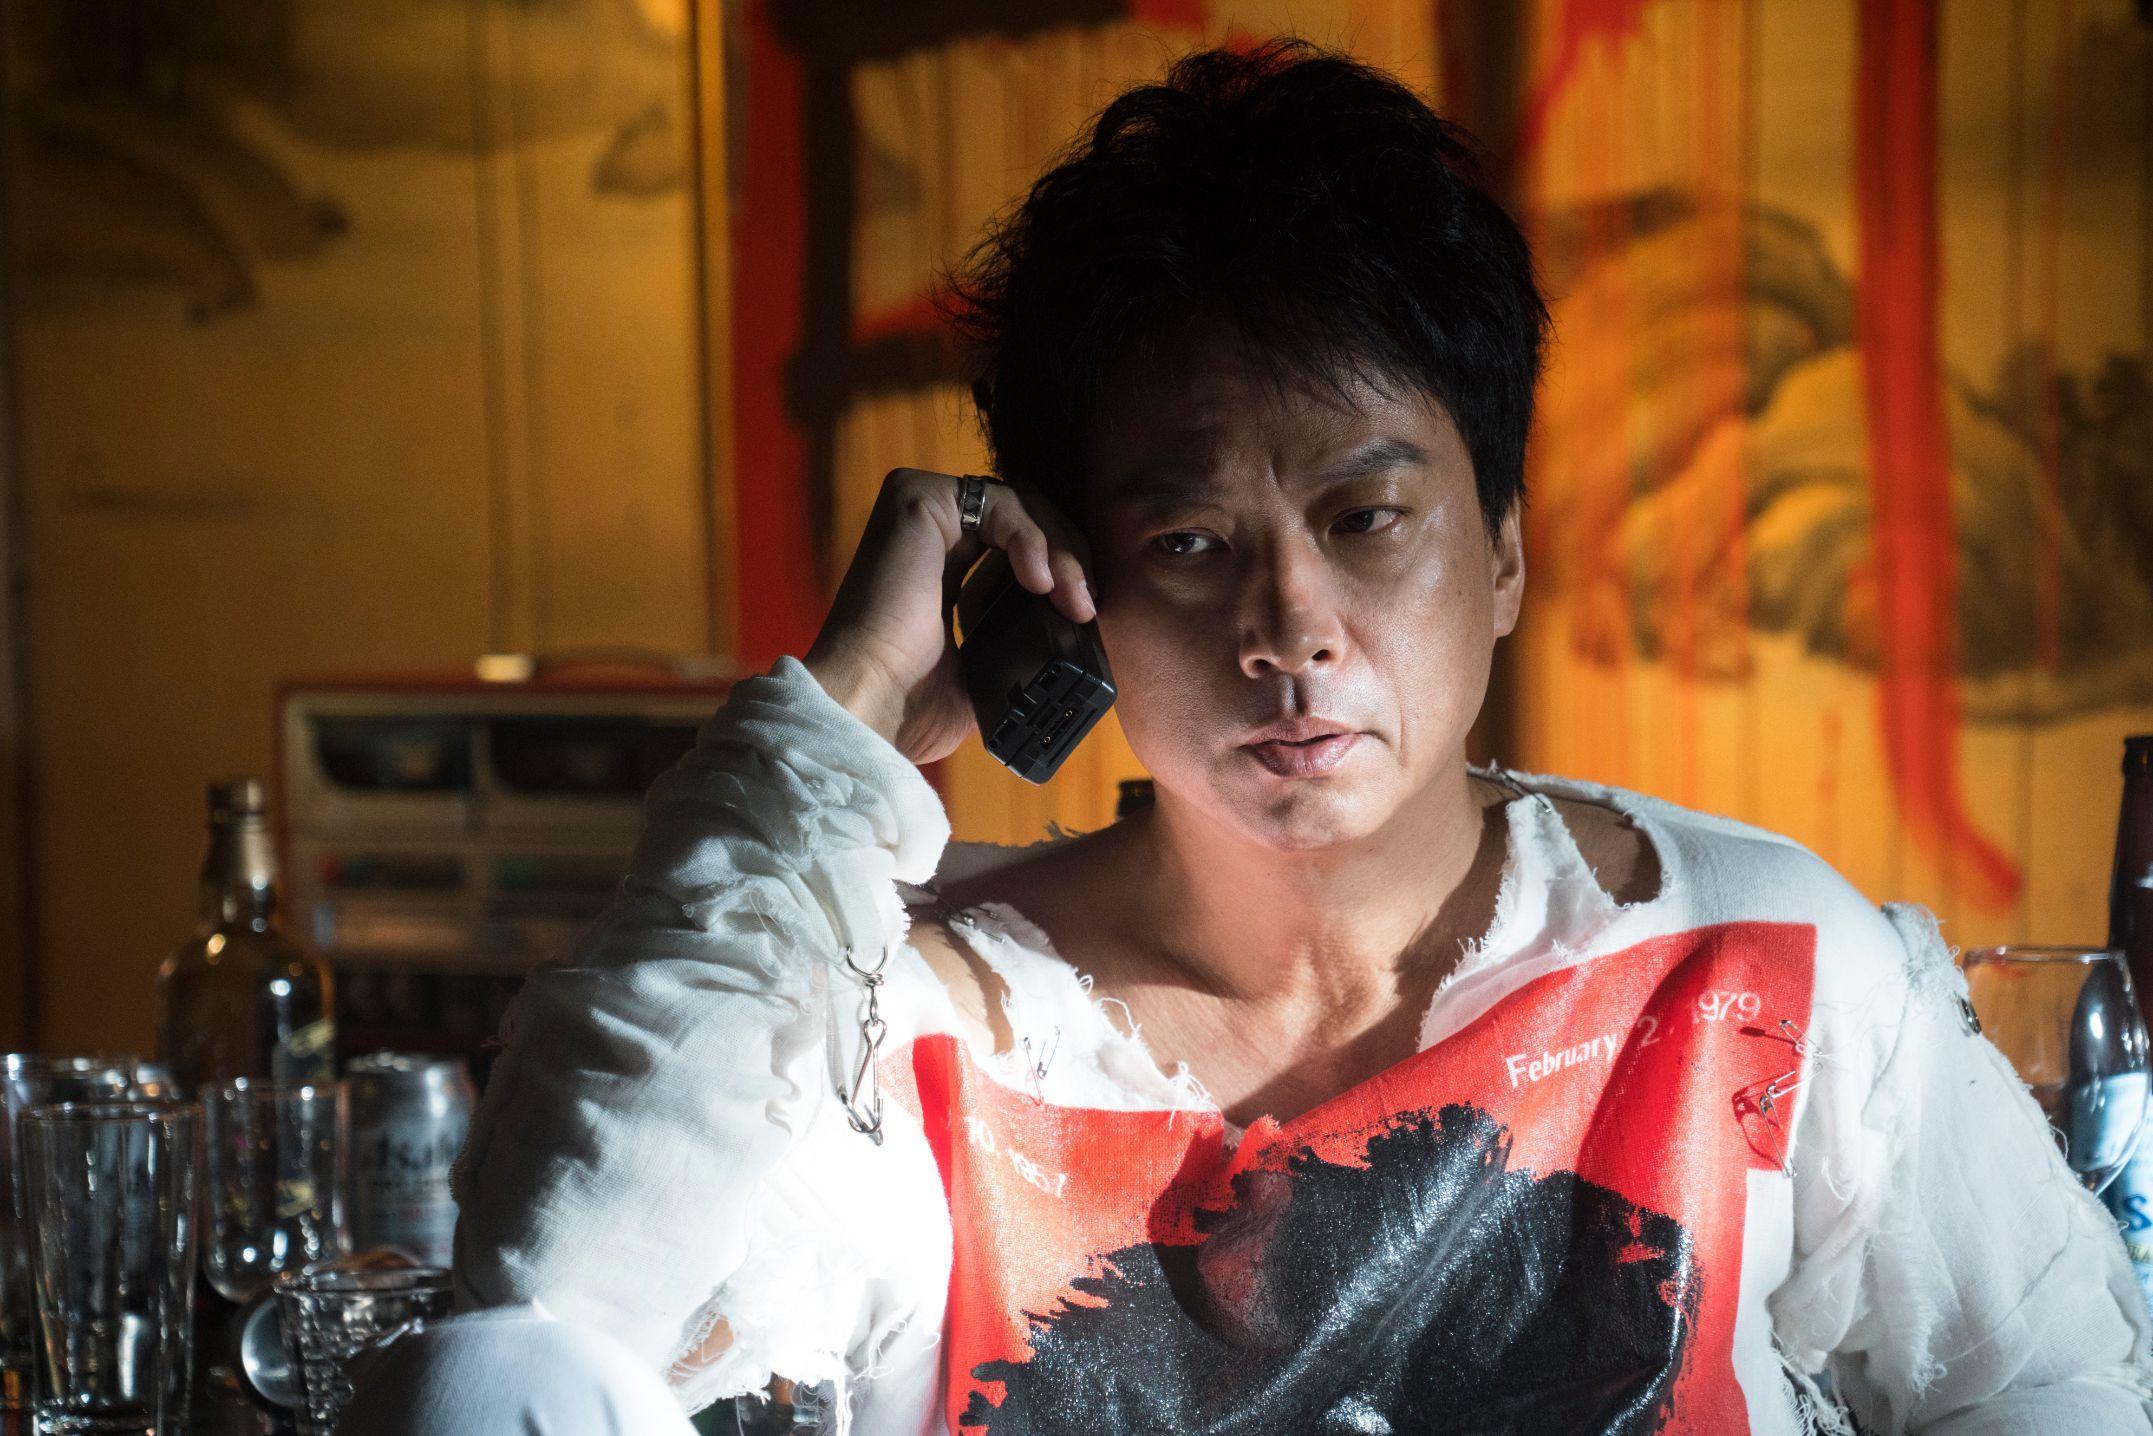 Netflixオリジナルシリーズ『愛なき森で叫べ : Deep Cut』は、2020年4月30日(木)、世界190か国へ配信予定